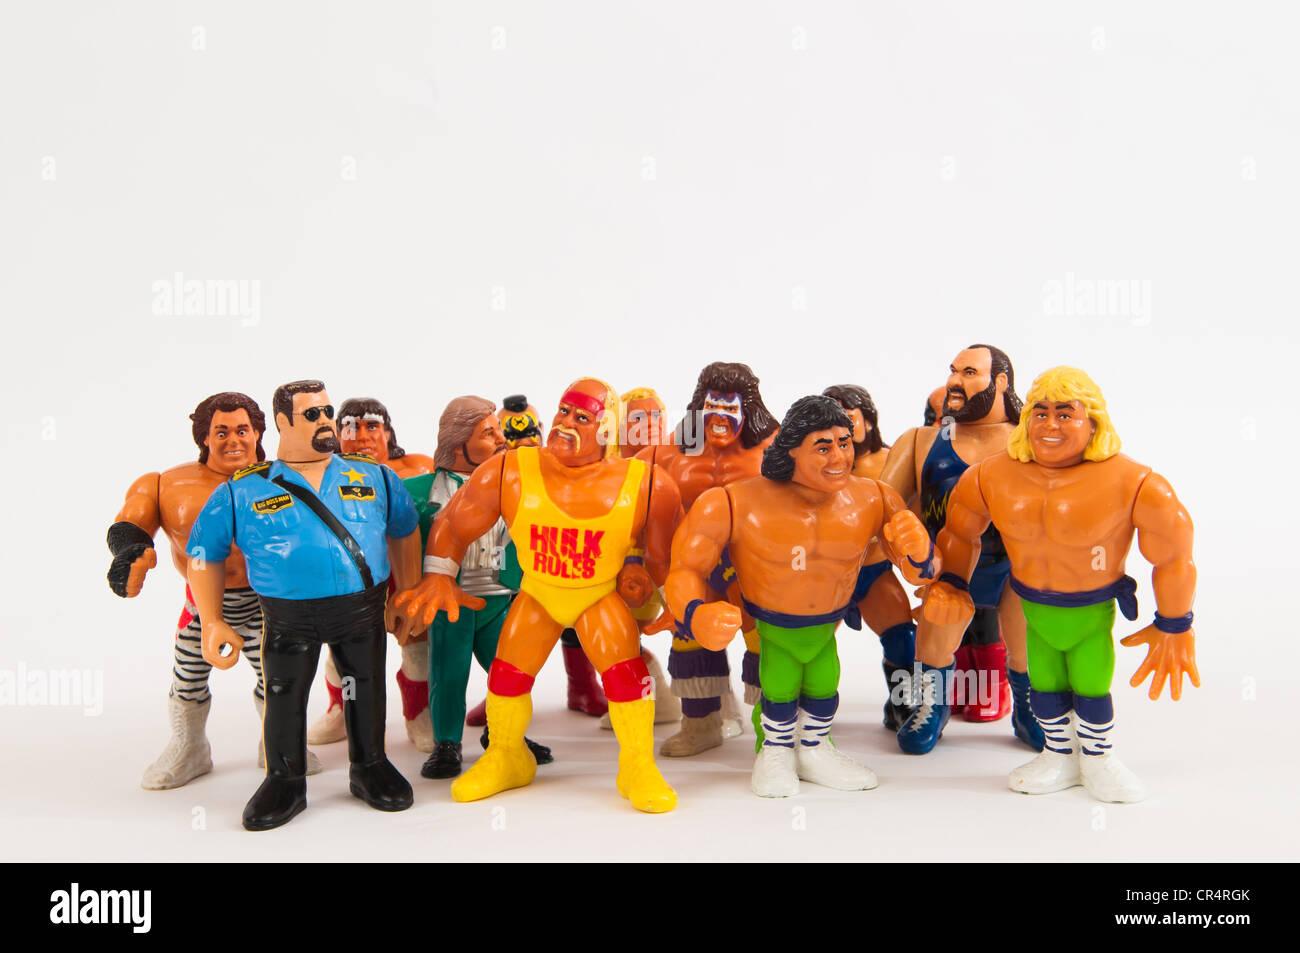 WWF Toy Wrestling cifras Imagen De Stock